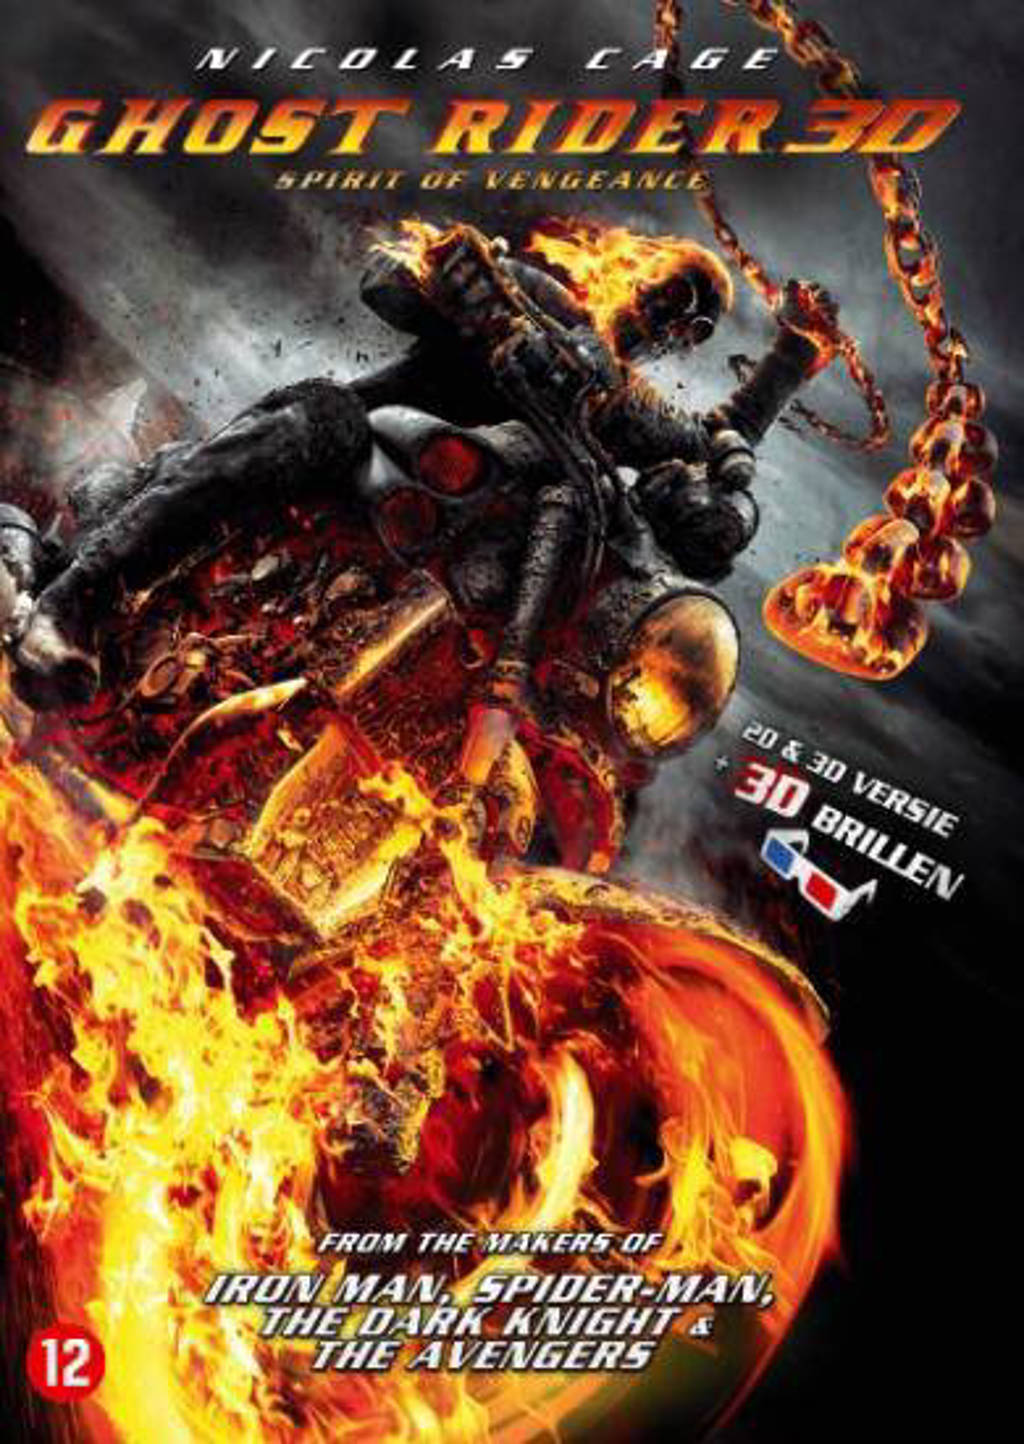 Ghost rider - Spirit of vengeance (DVD)